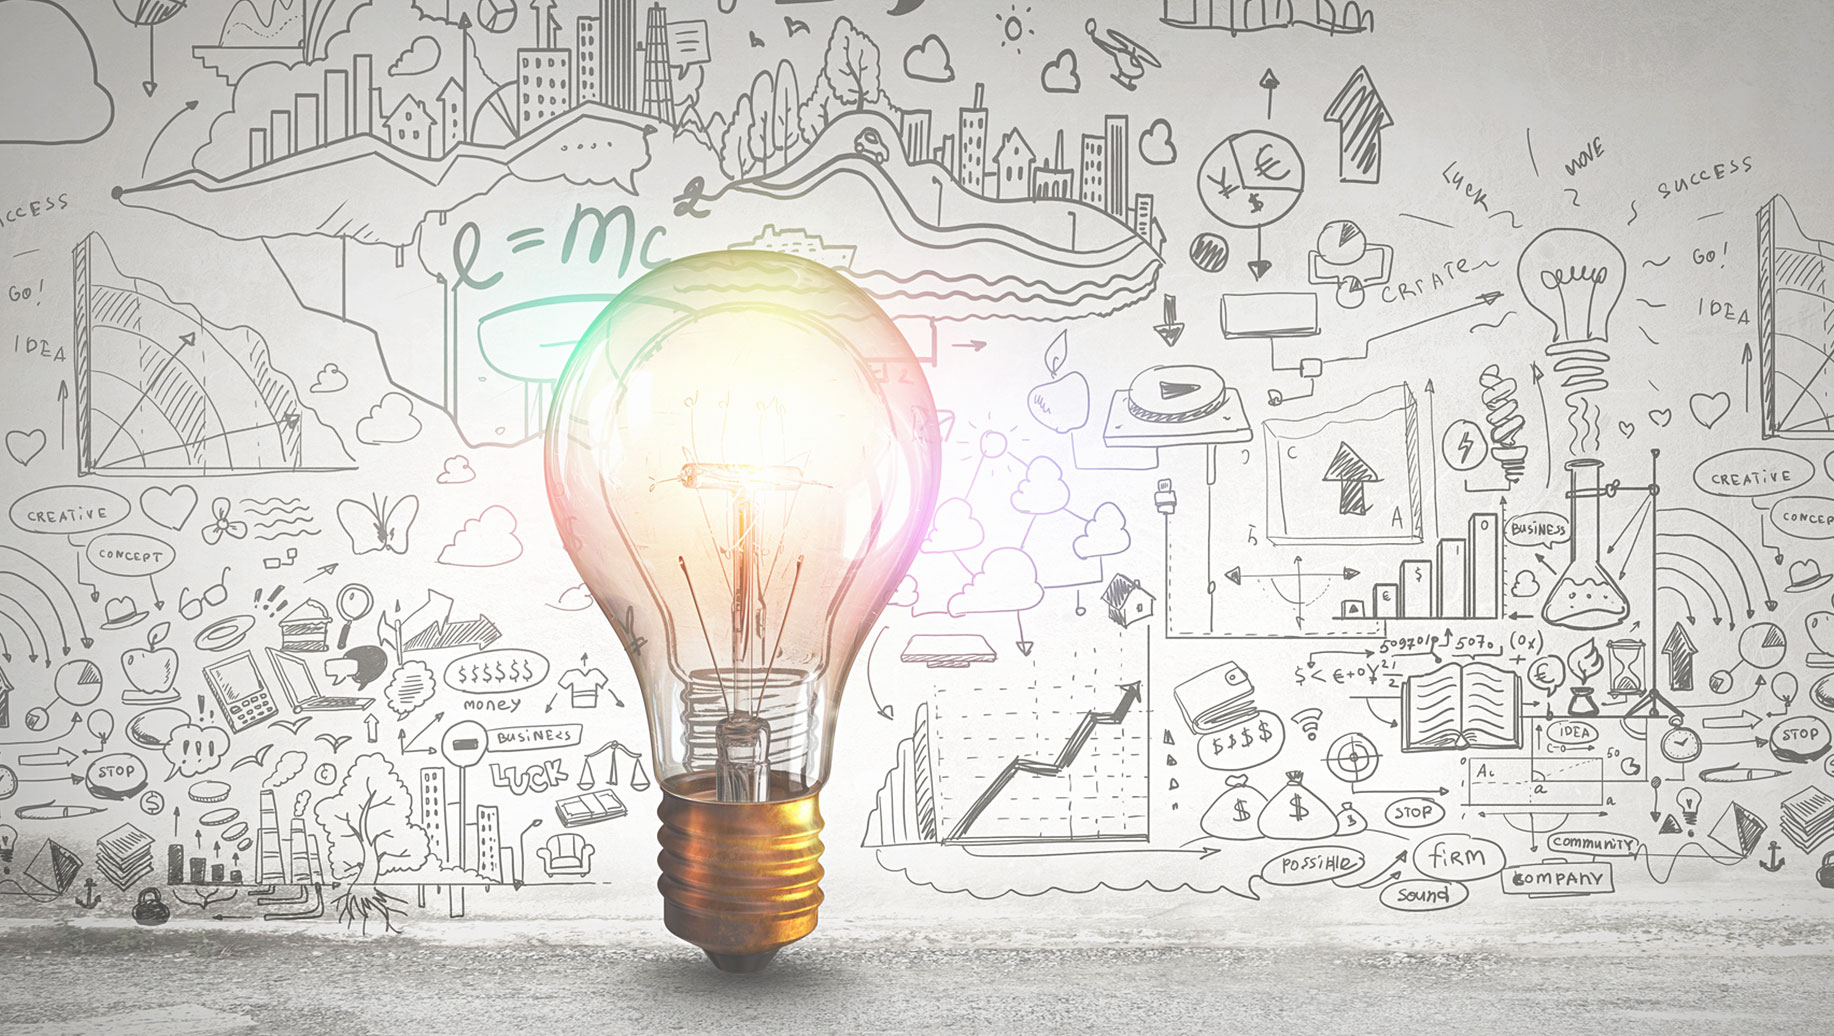 11 Experts List Their Top Insurance Marketing Ideas